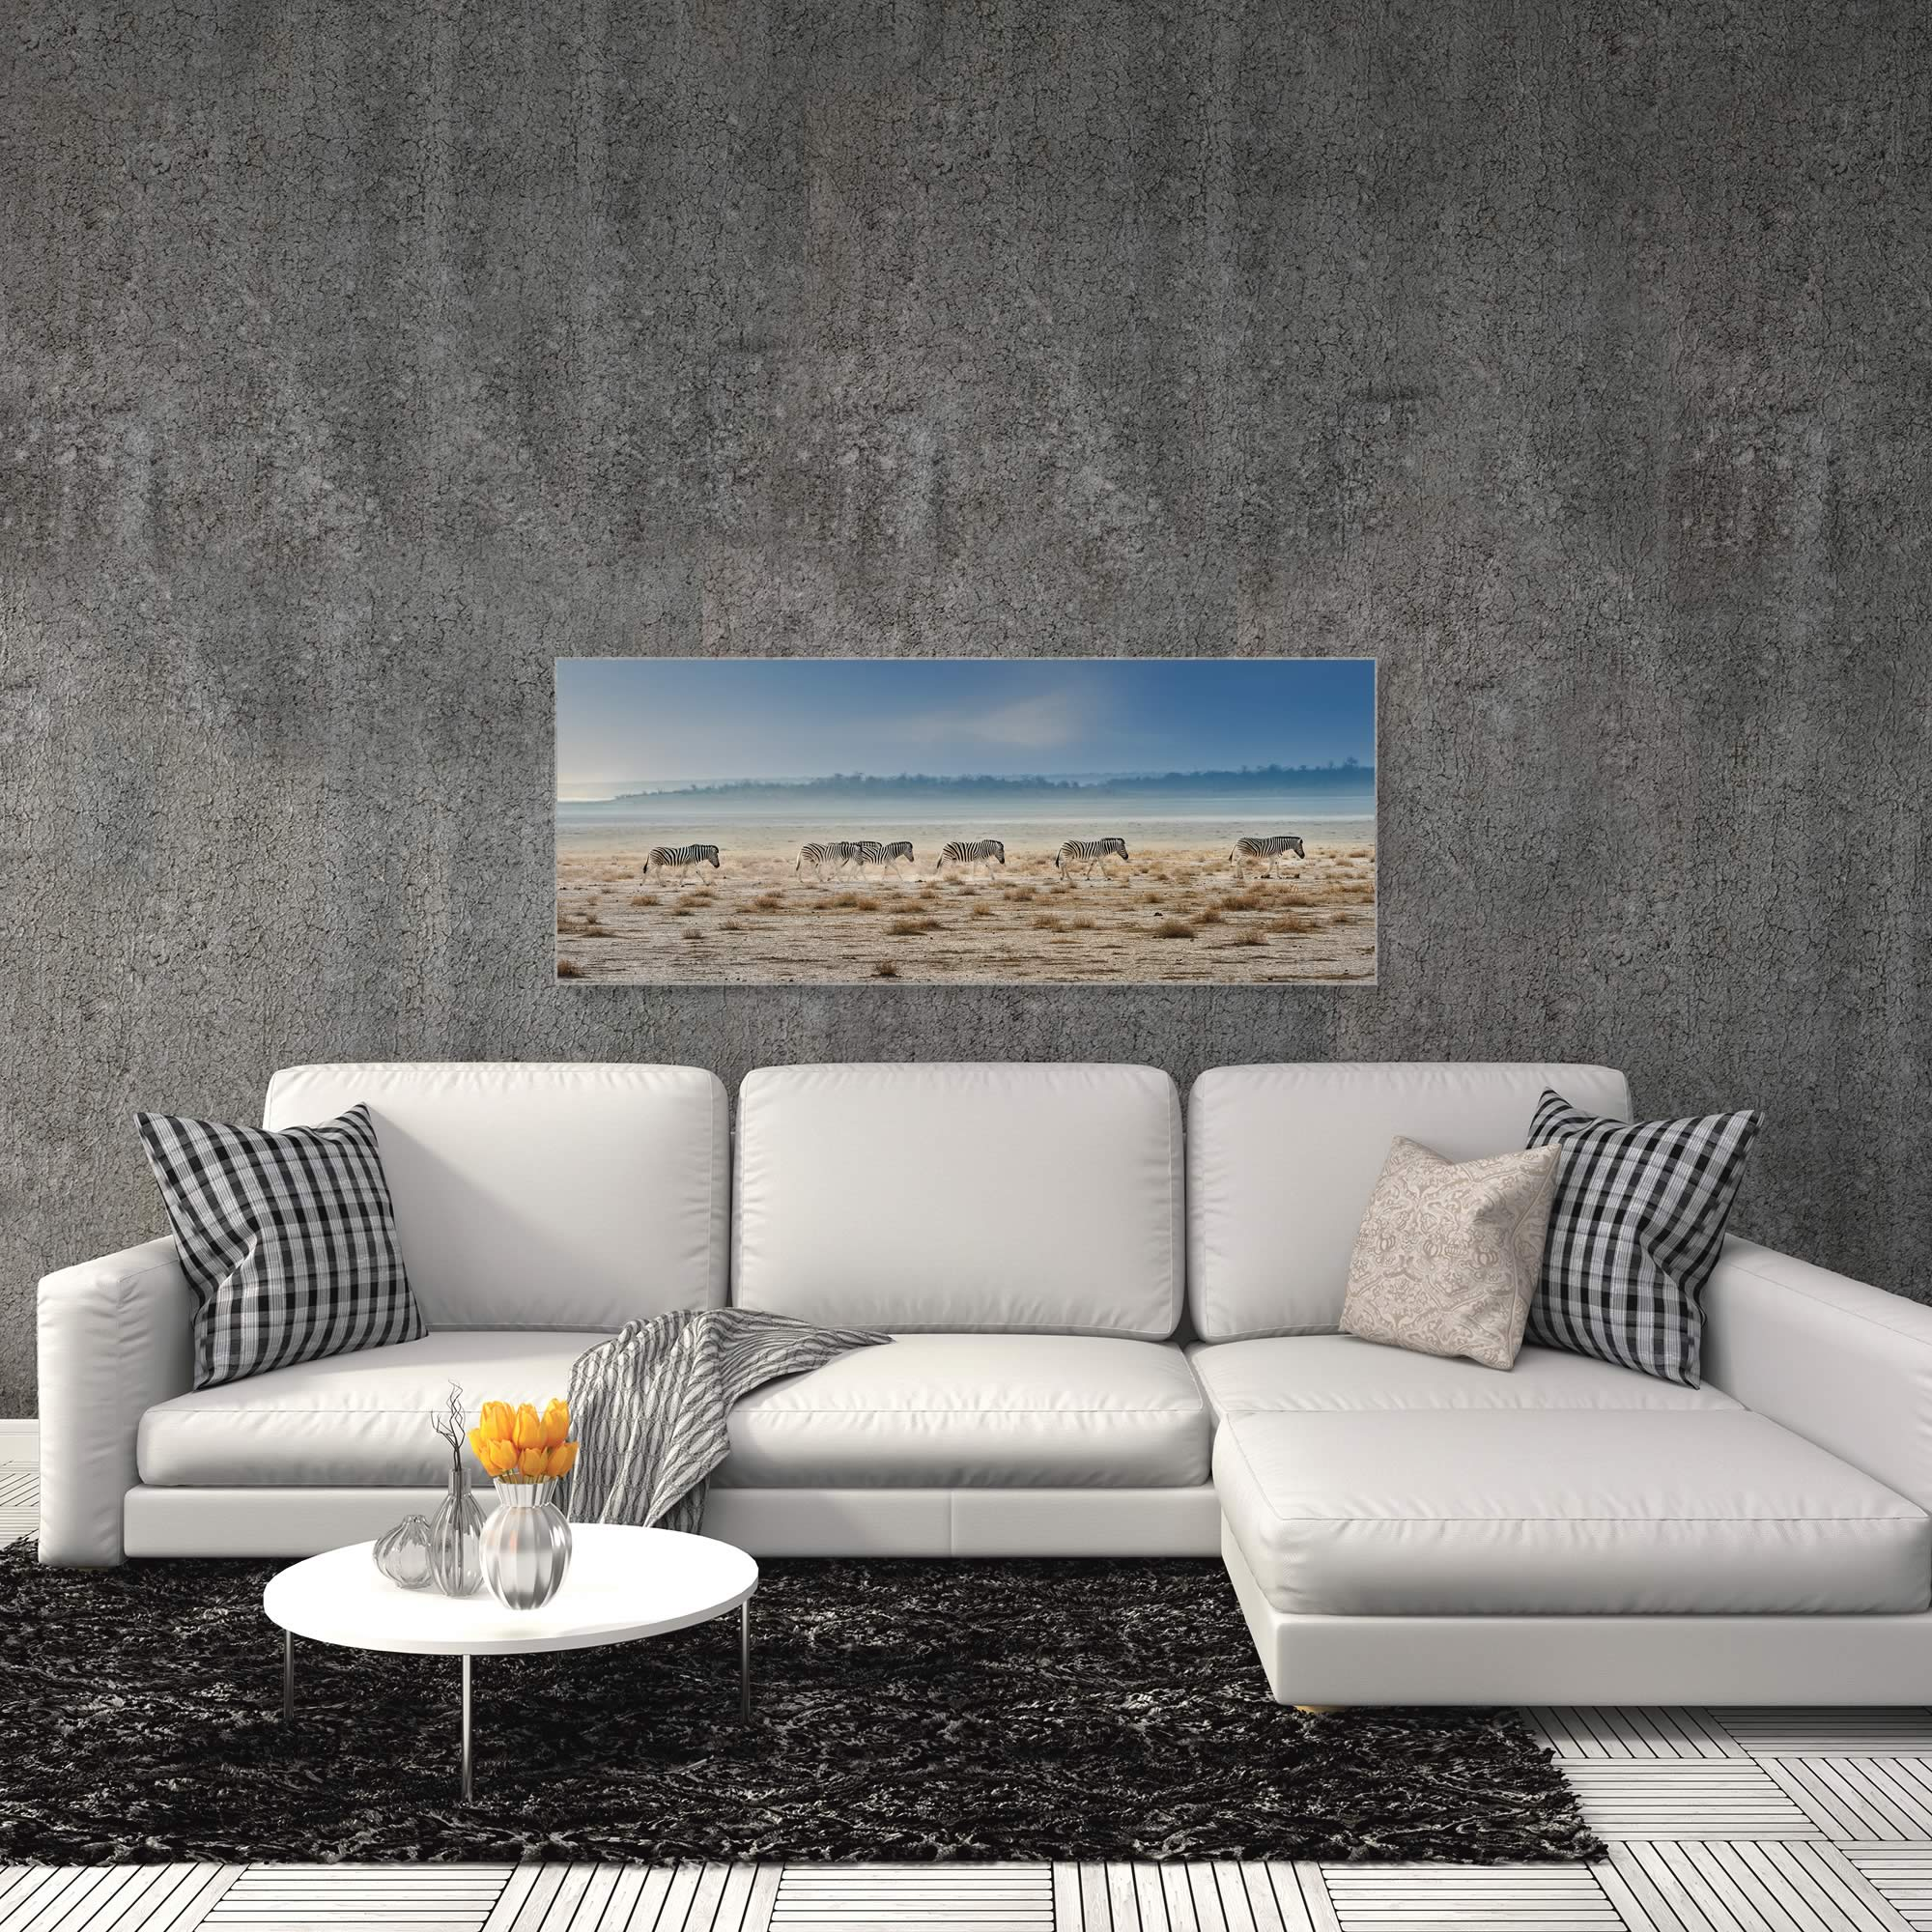 Zebra Promenade by Piet Flour - Zebra Wall Art on Metal or Acrylic - Alternate View 3